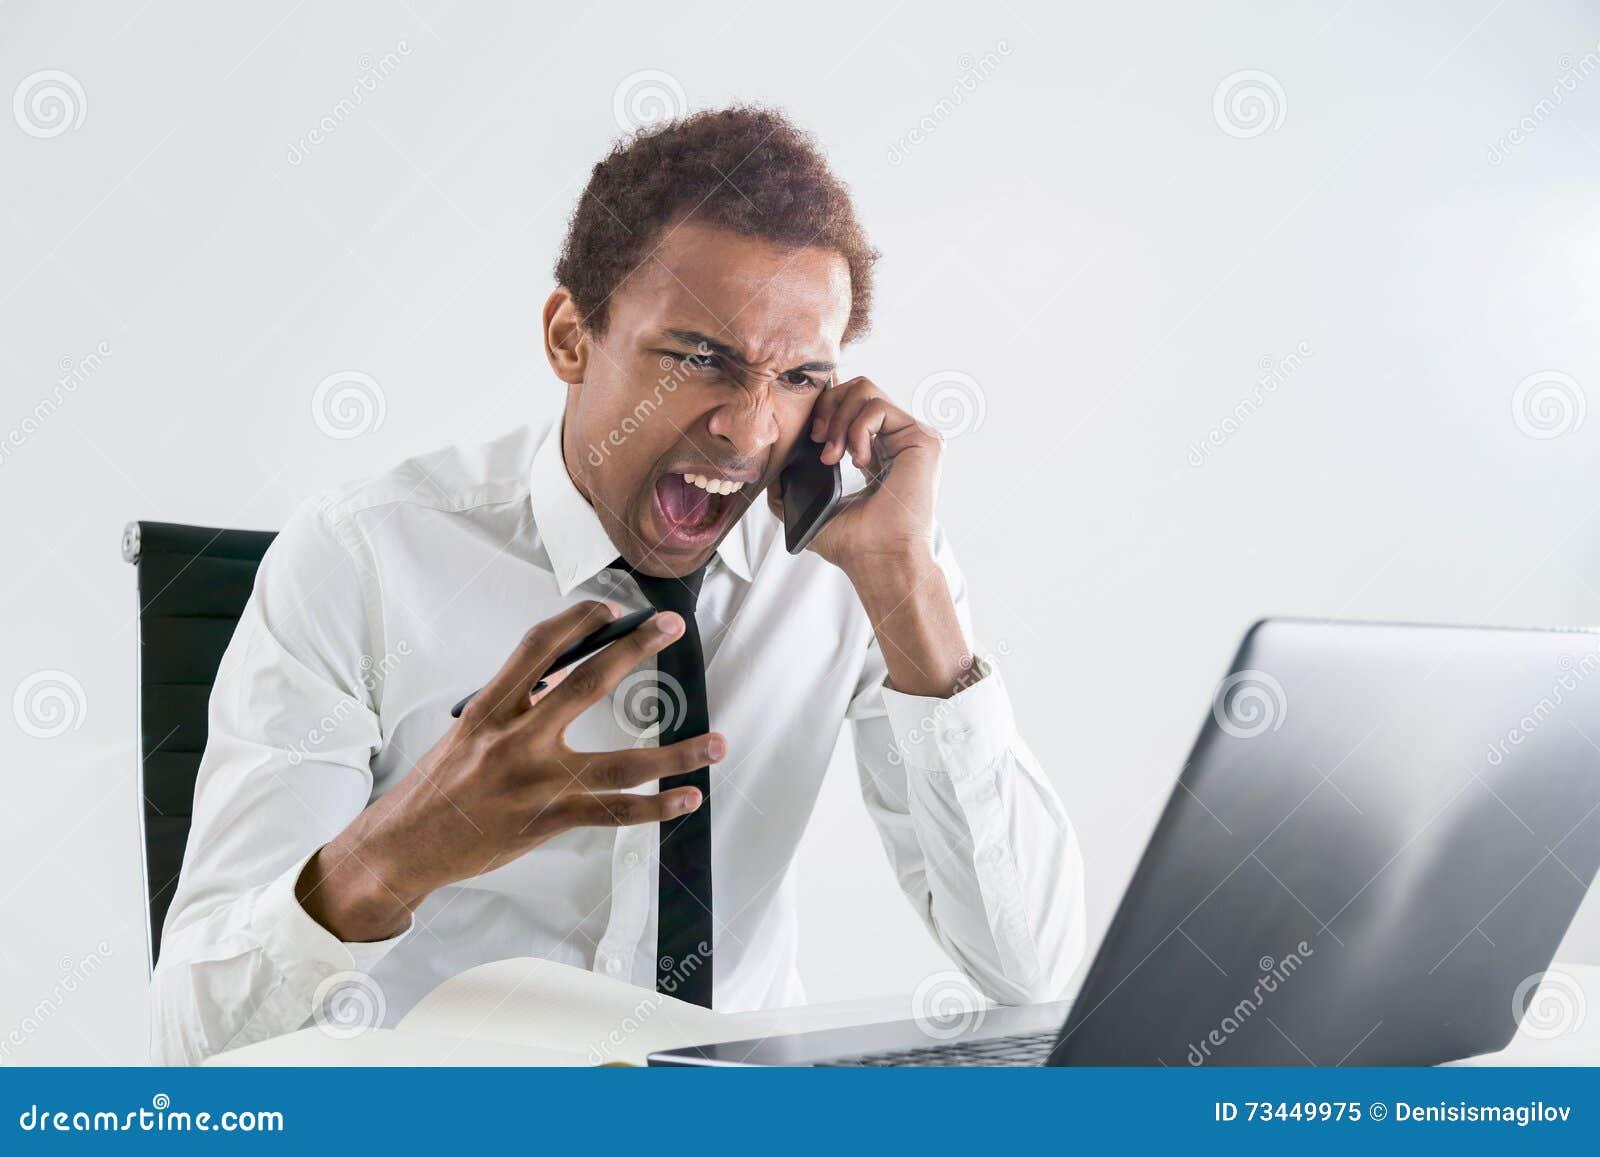 Furious man shouting on phone